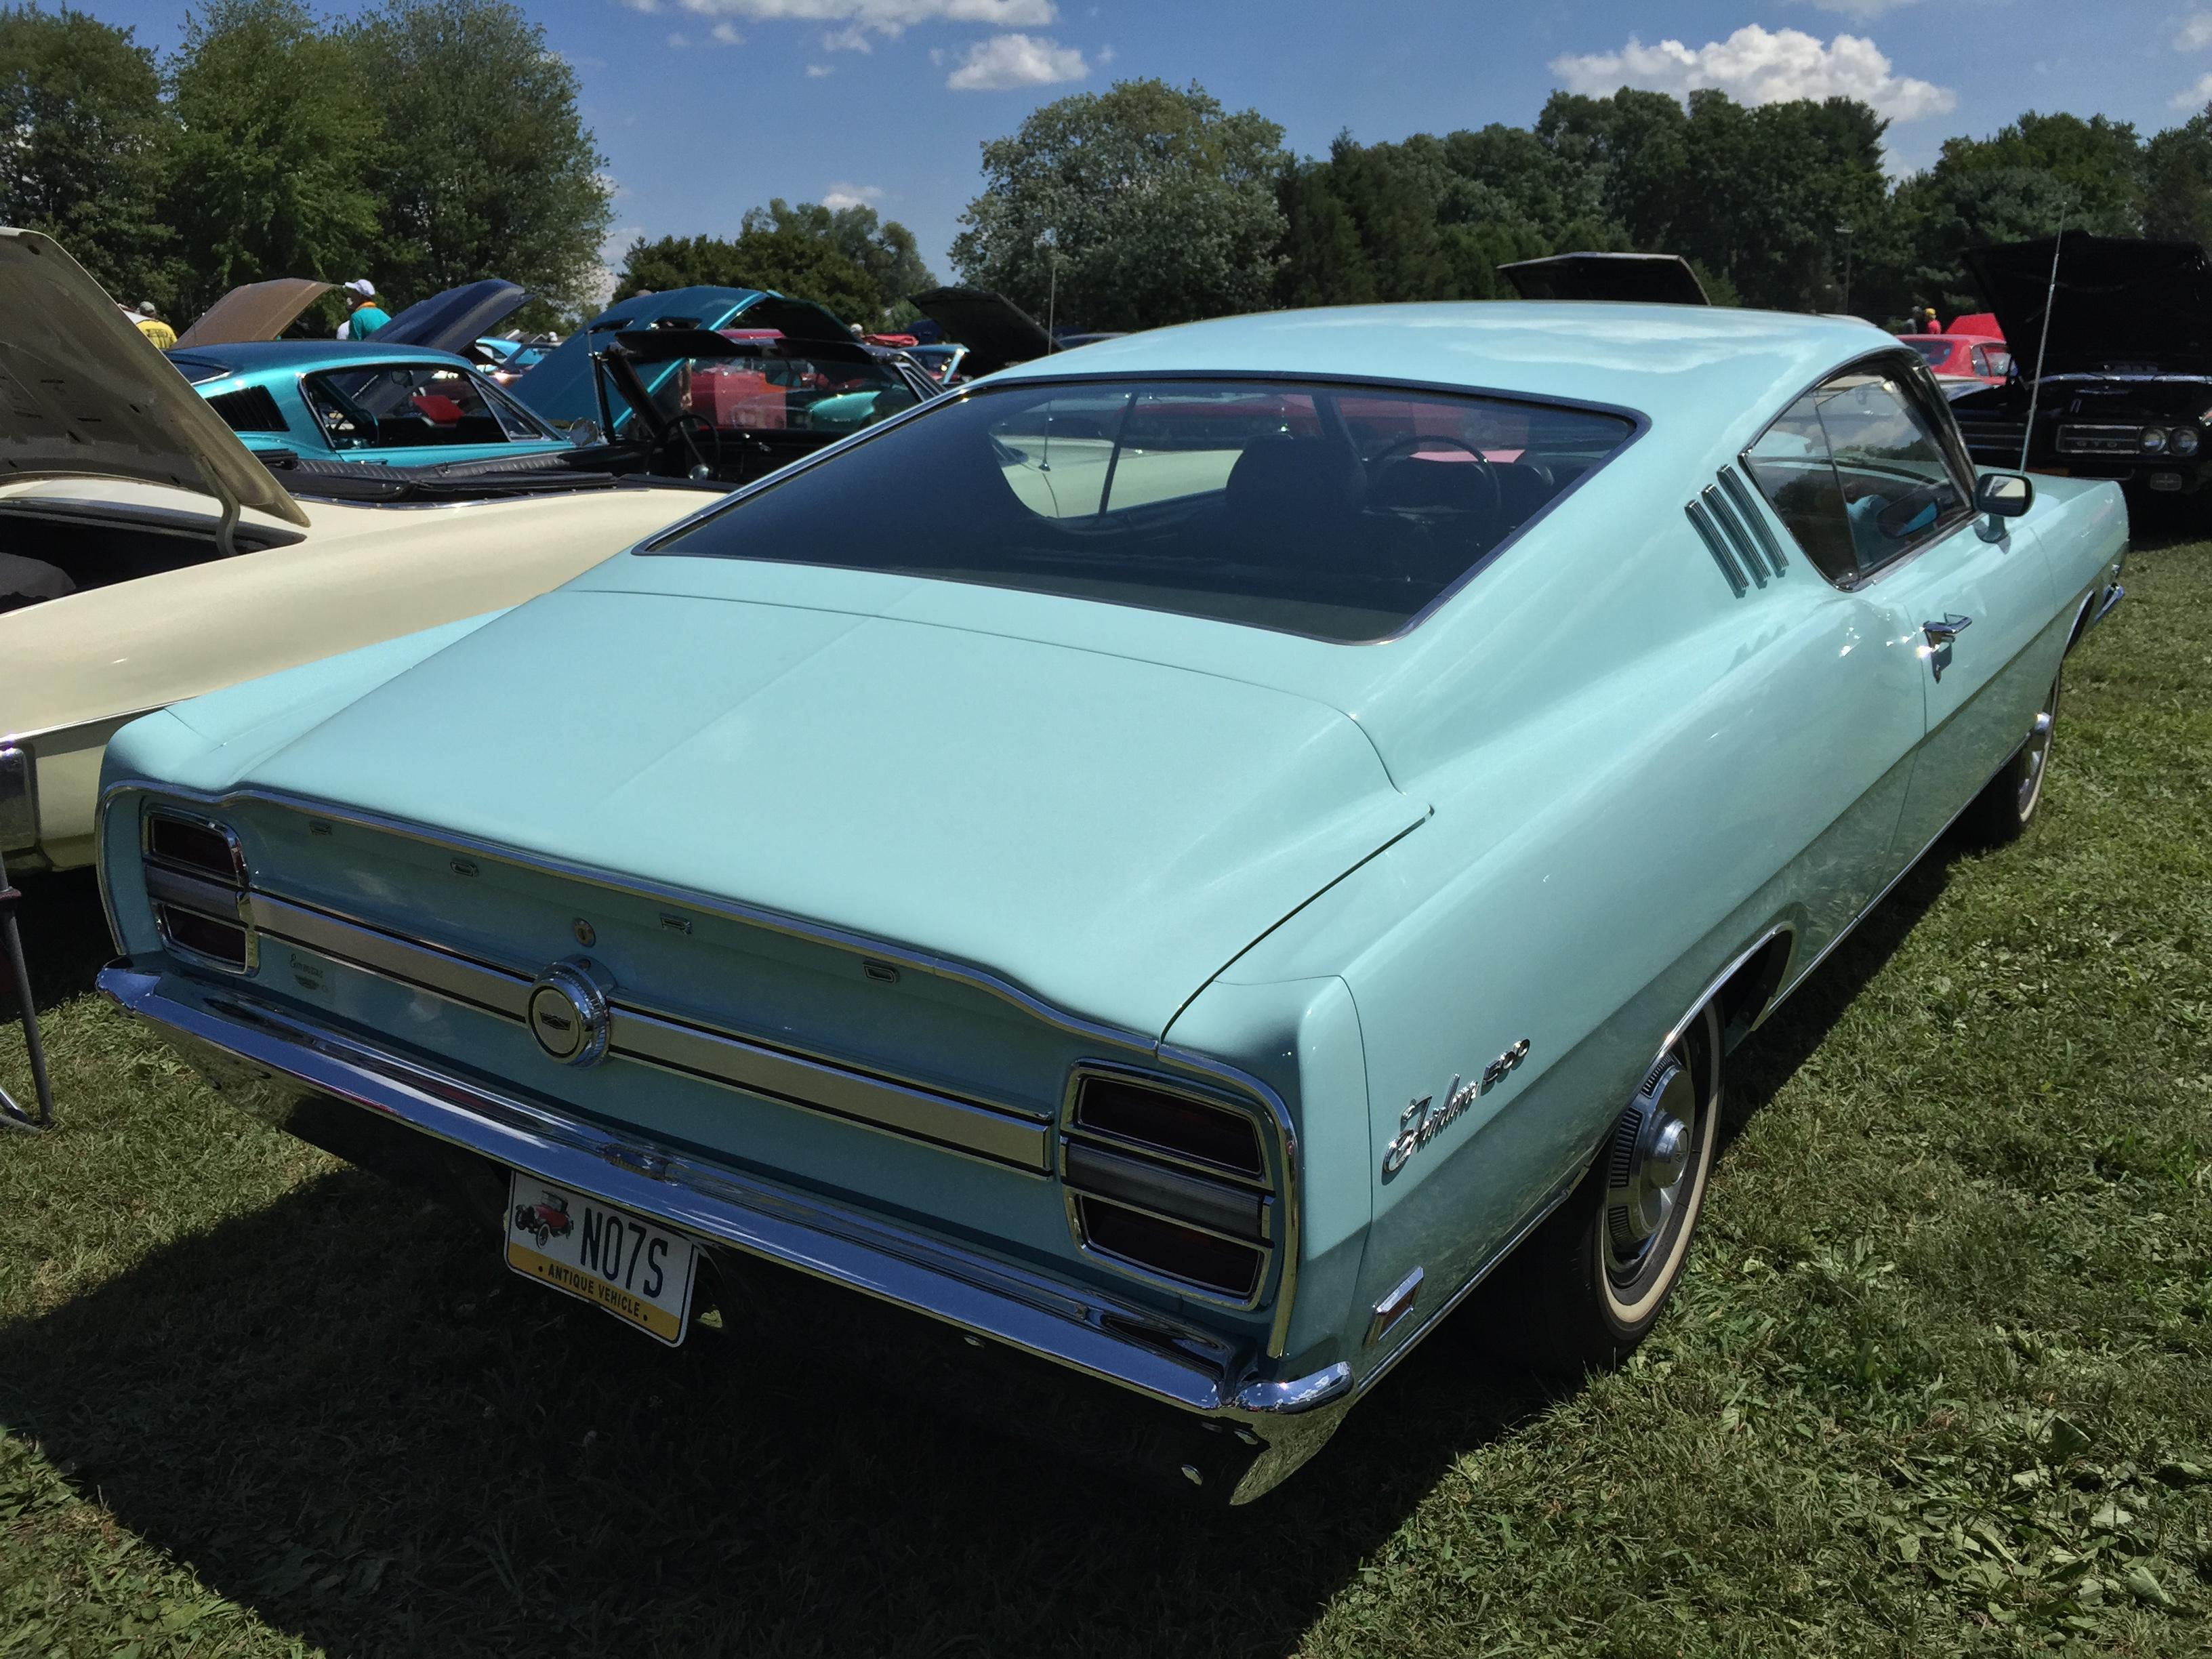 1963 Ford Falcon Wiring Diagram Auto Electrical 1995 Bronco Fuse Box 1970 Mercury Cyclone Parts